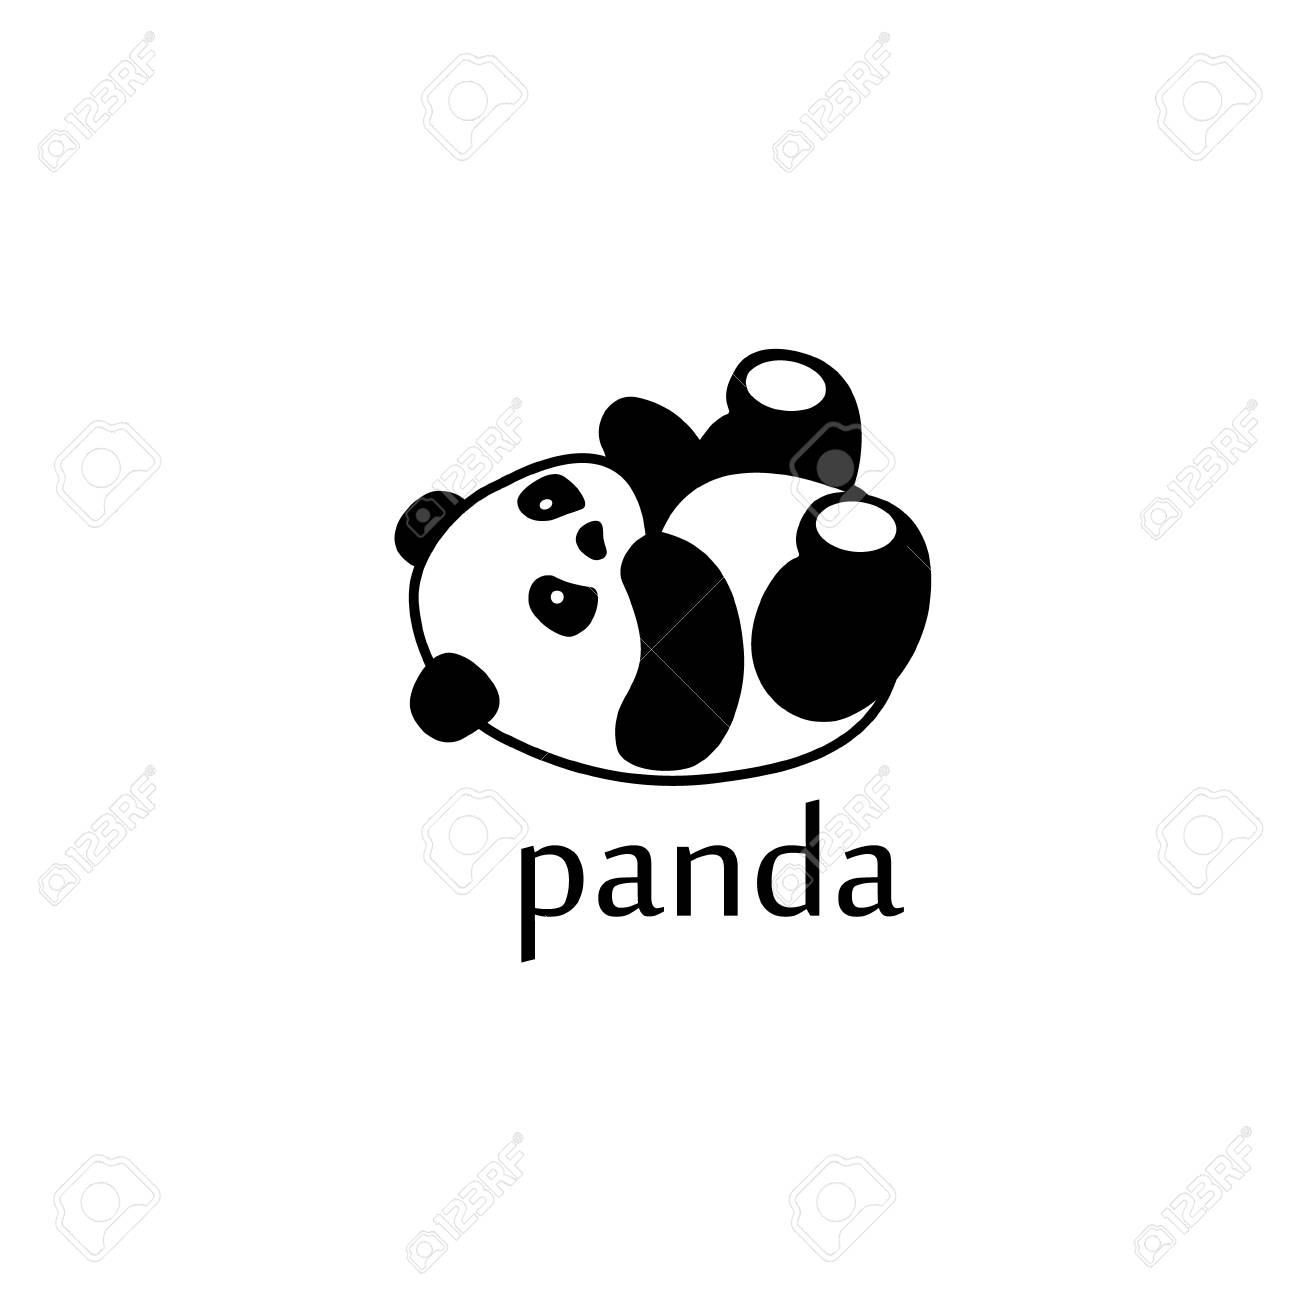 Panda Template | Raster Illustration Panda Bear Silhouette Design Template Stock